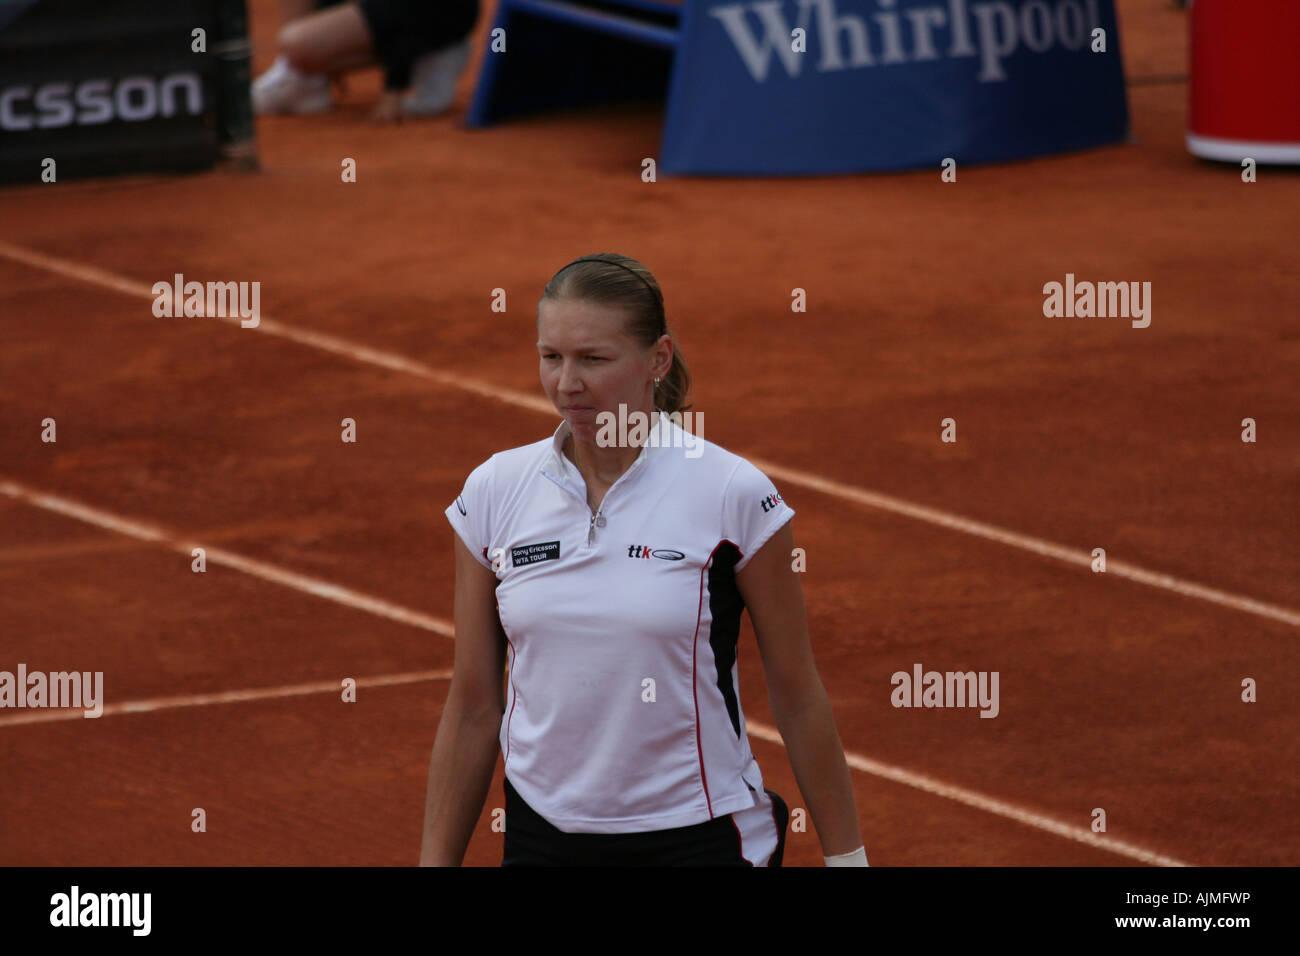 Estoril Open 2007 - Women's 1st round qualifying - Selima Sfar vs Renata Voracova Stock Photo